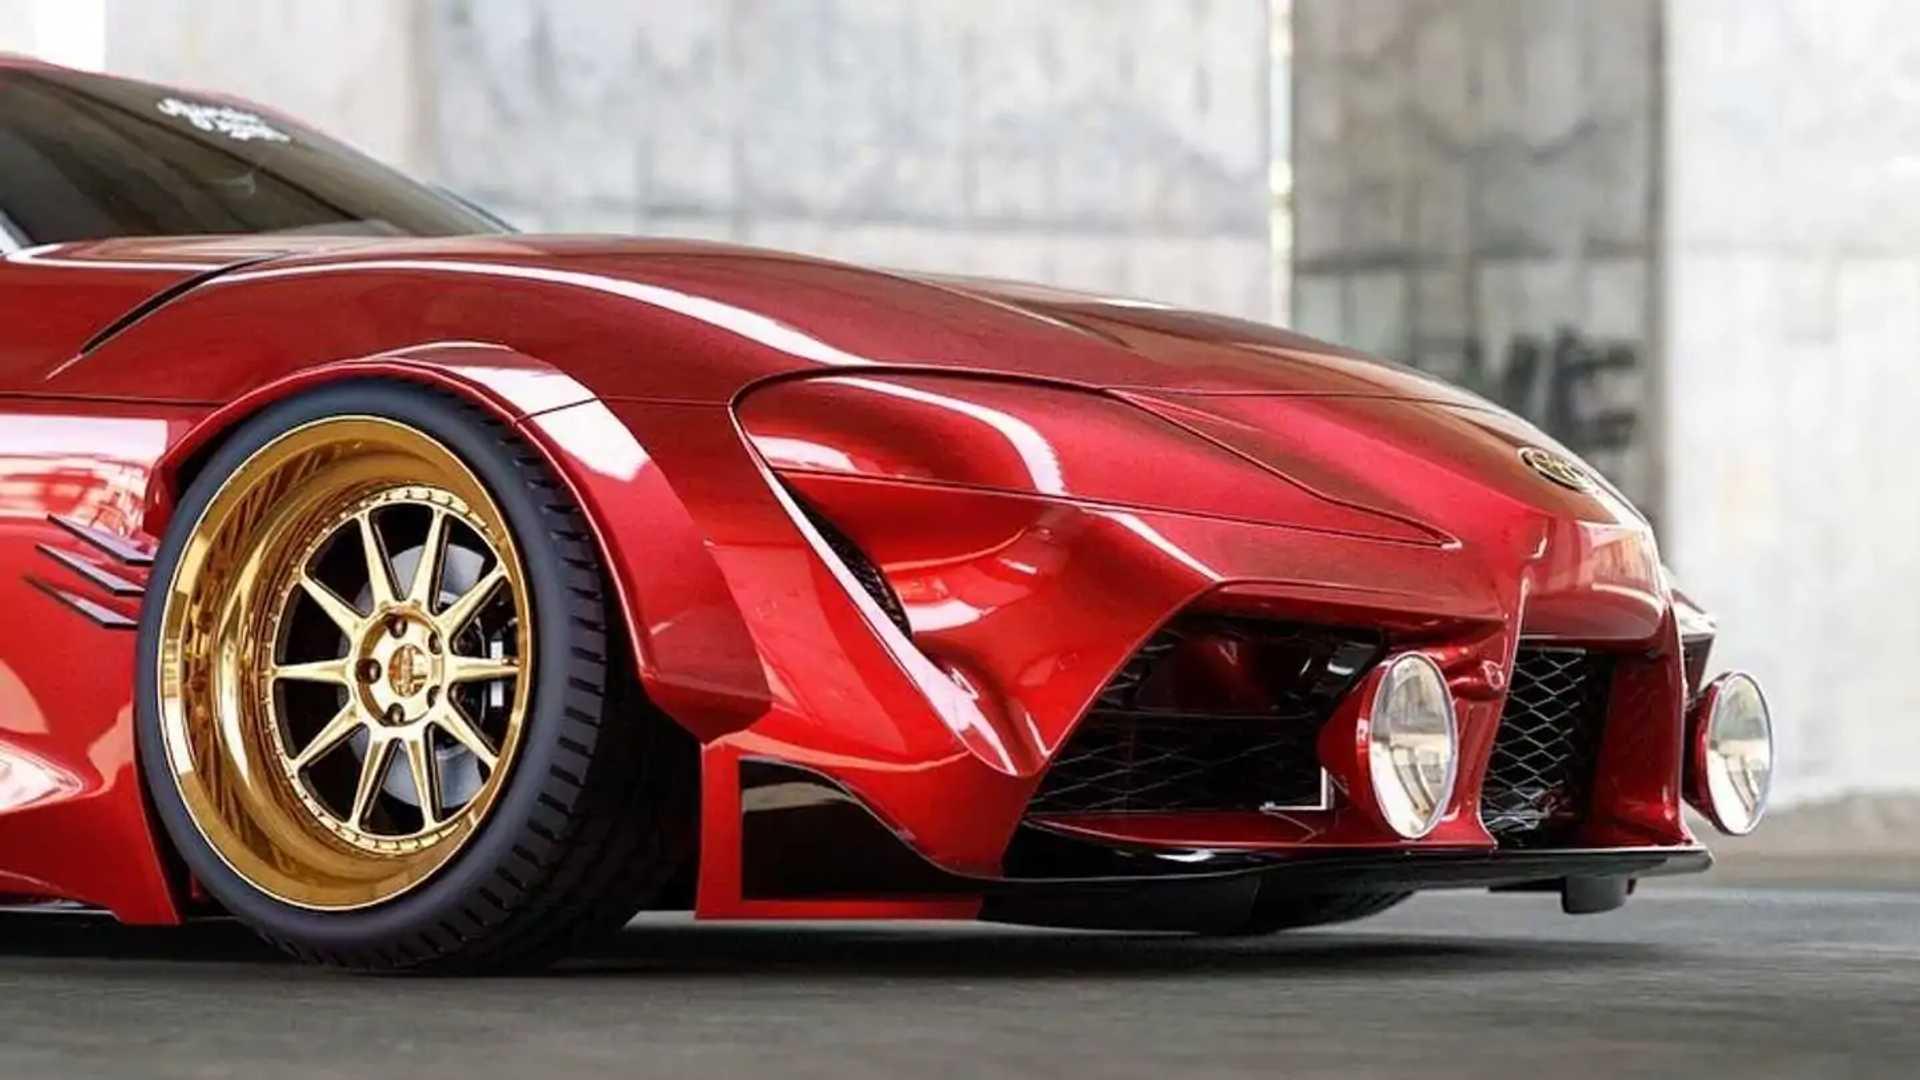 Widebody Toyota Supra rendering